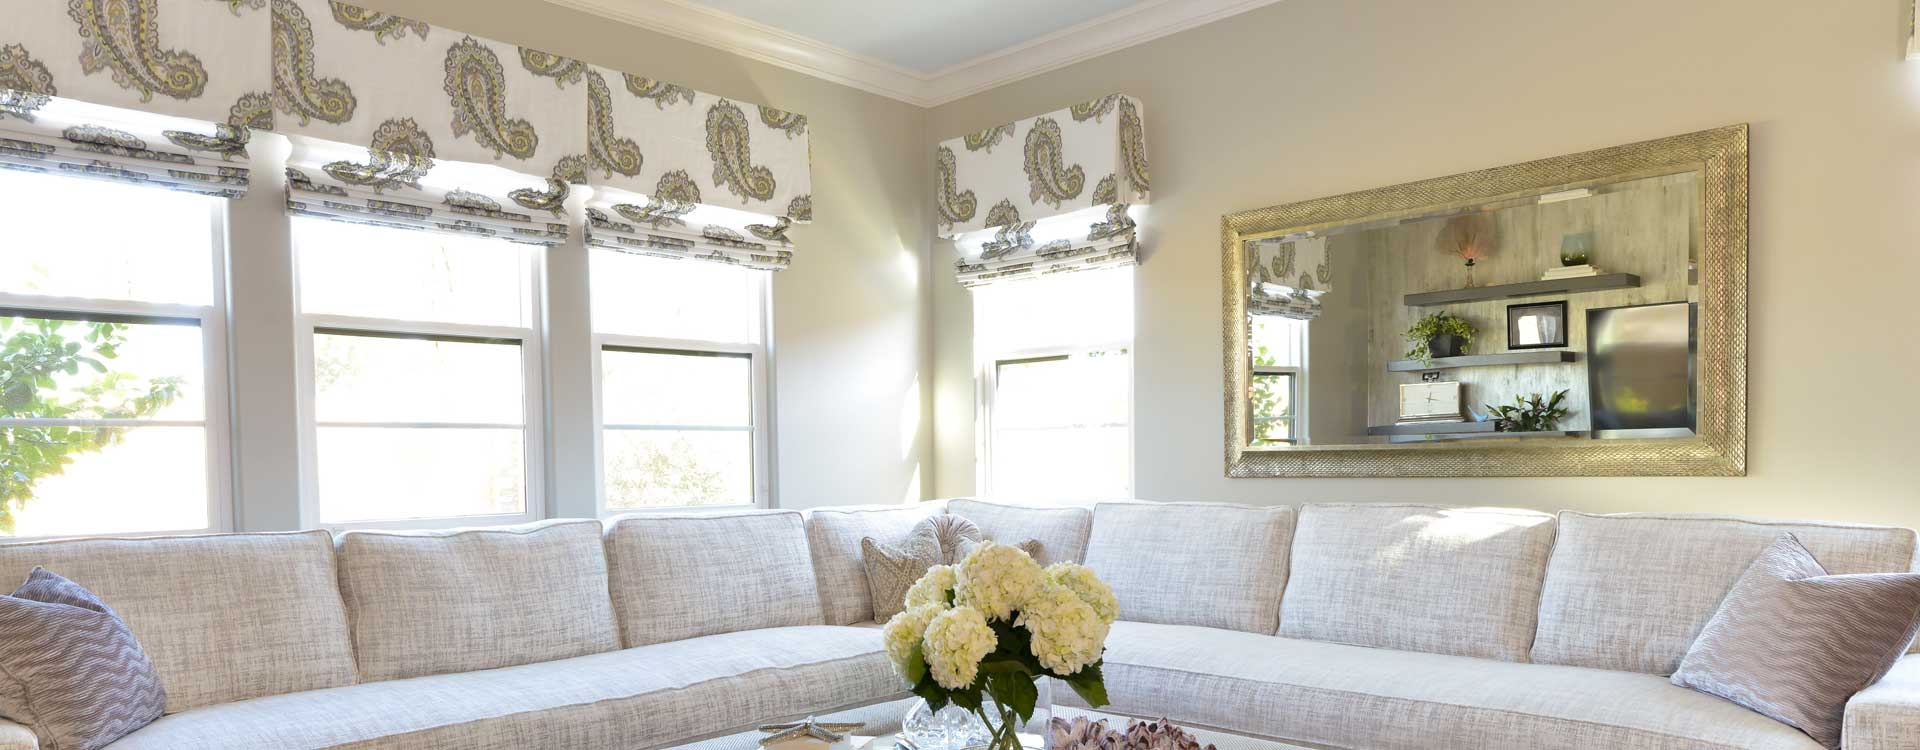 custom fabric shades online valances roman shades direct regal drapes. Black Bedroom Furniture Sets. Home Design Ideas